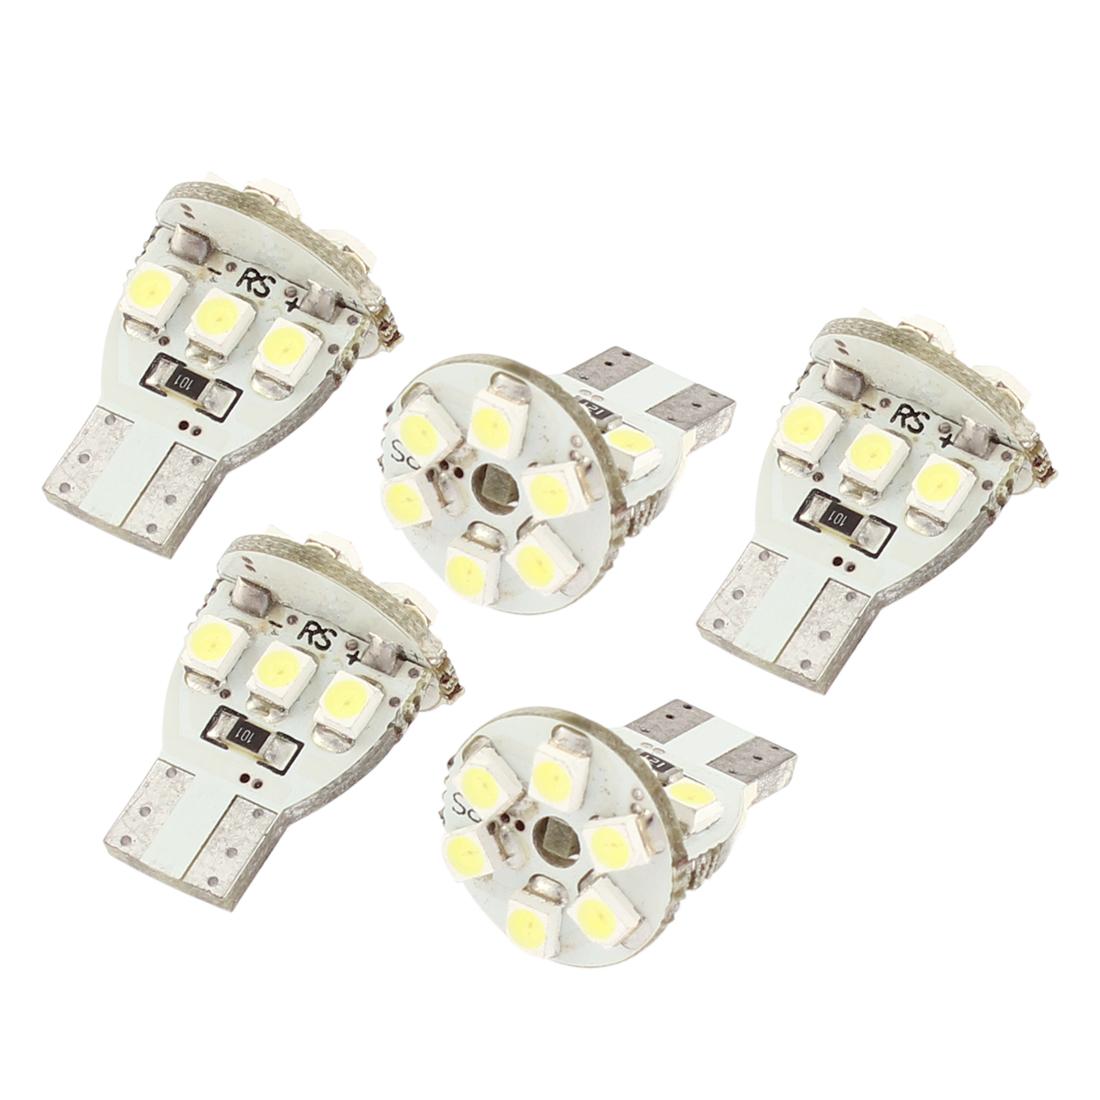 5 Pcs T10 194 White 1210 12-SMD LED Dashboard Light Signal Bulbs 12V Internal